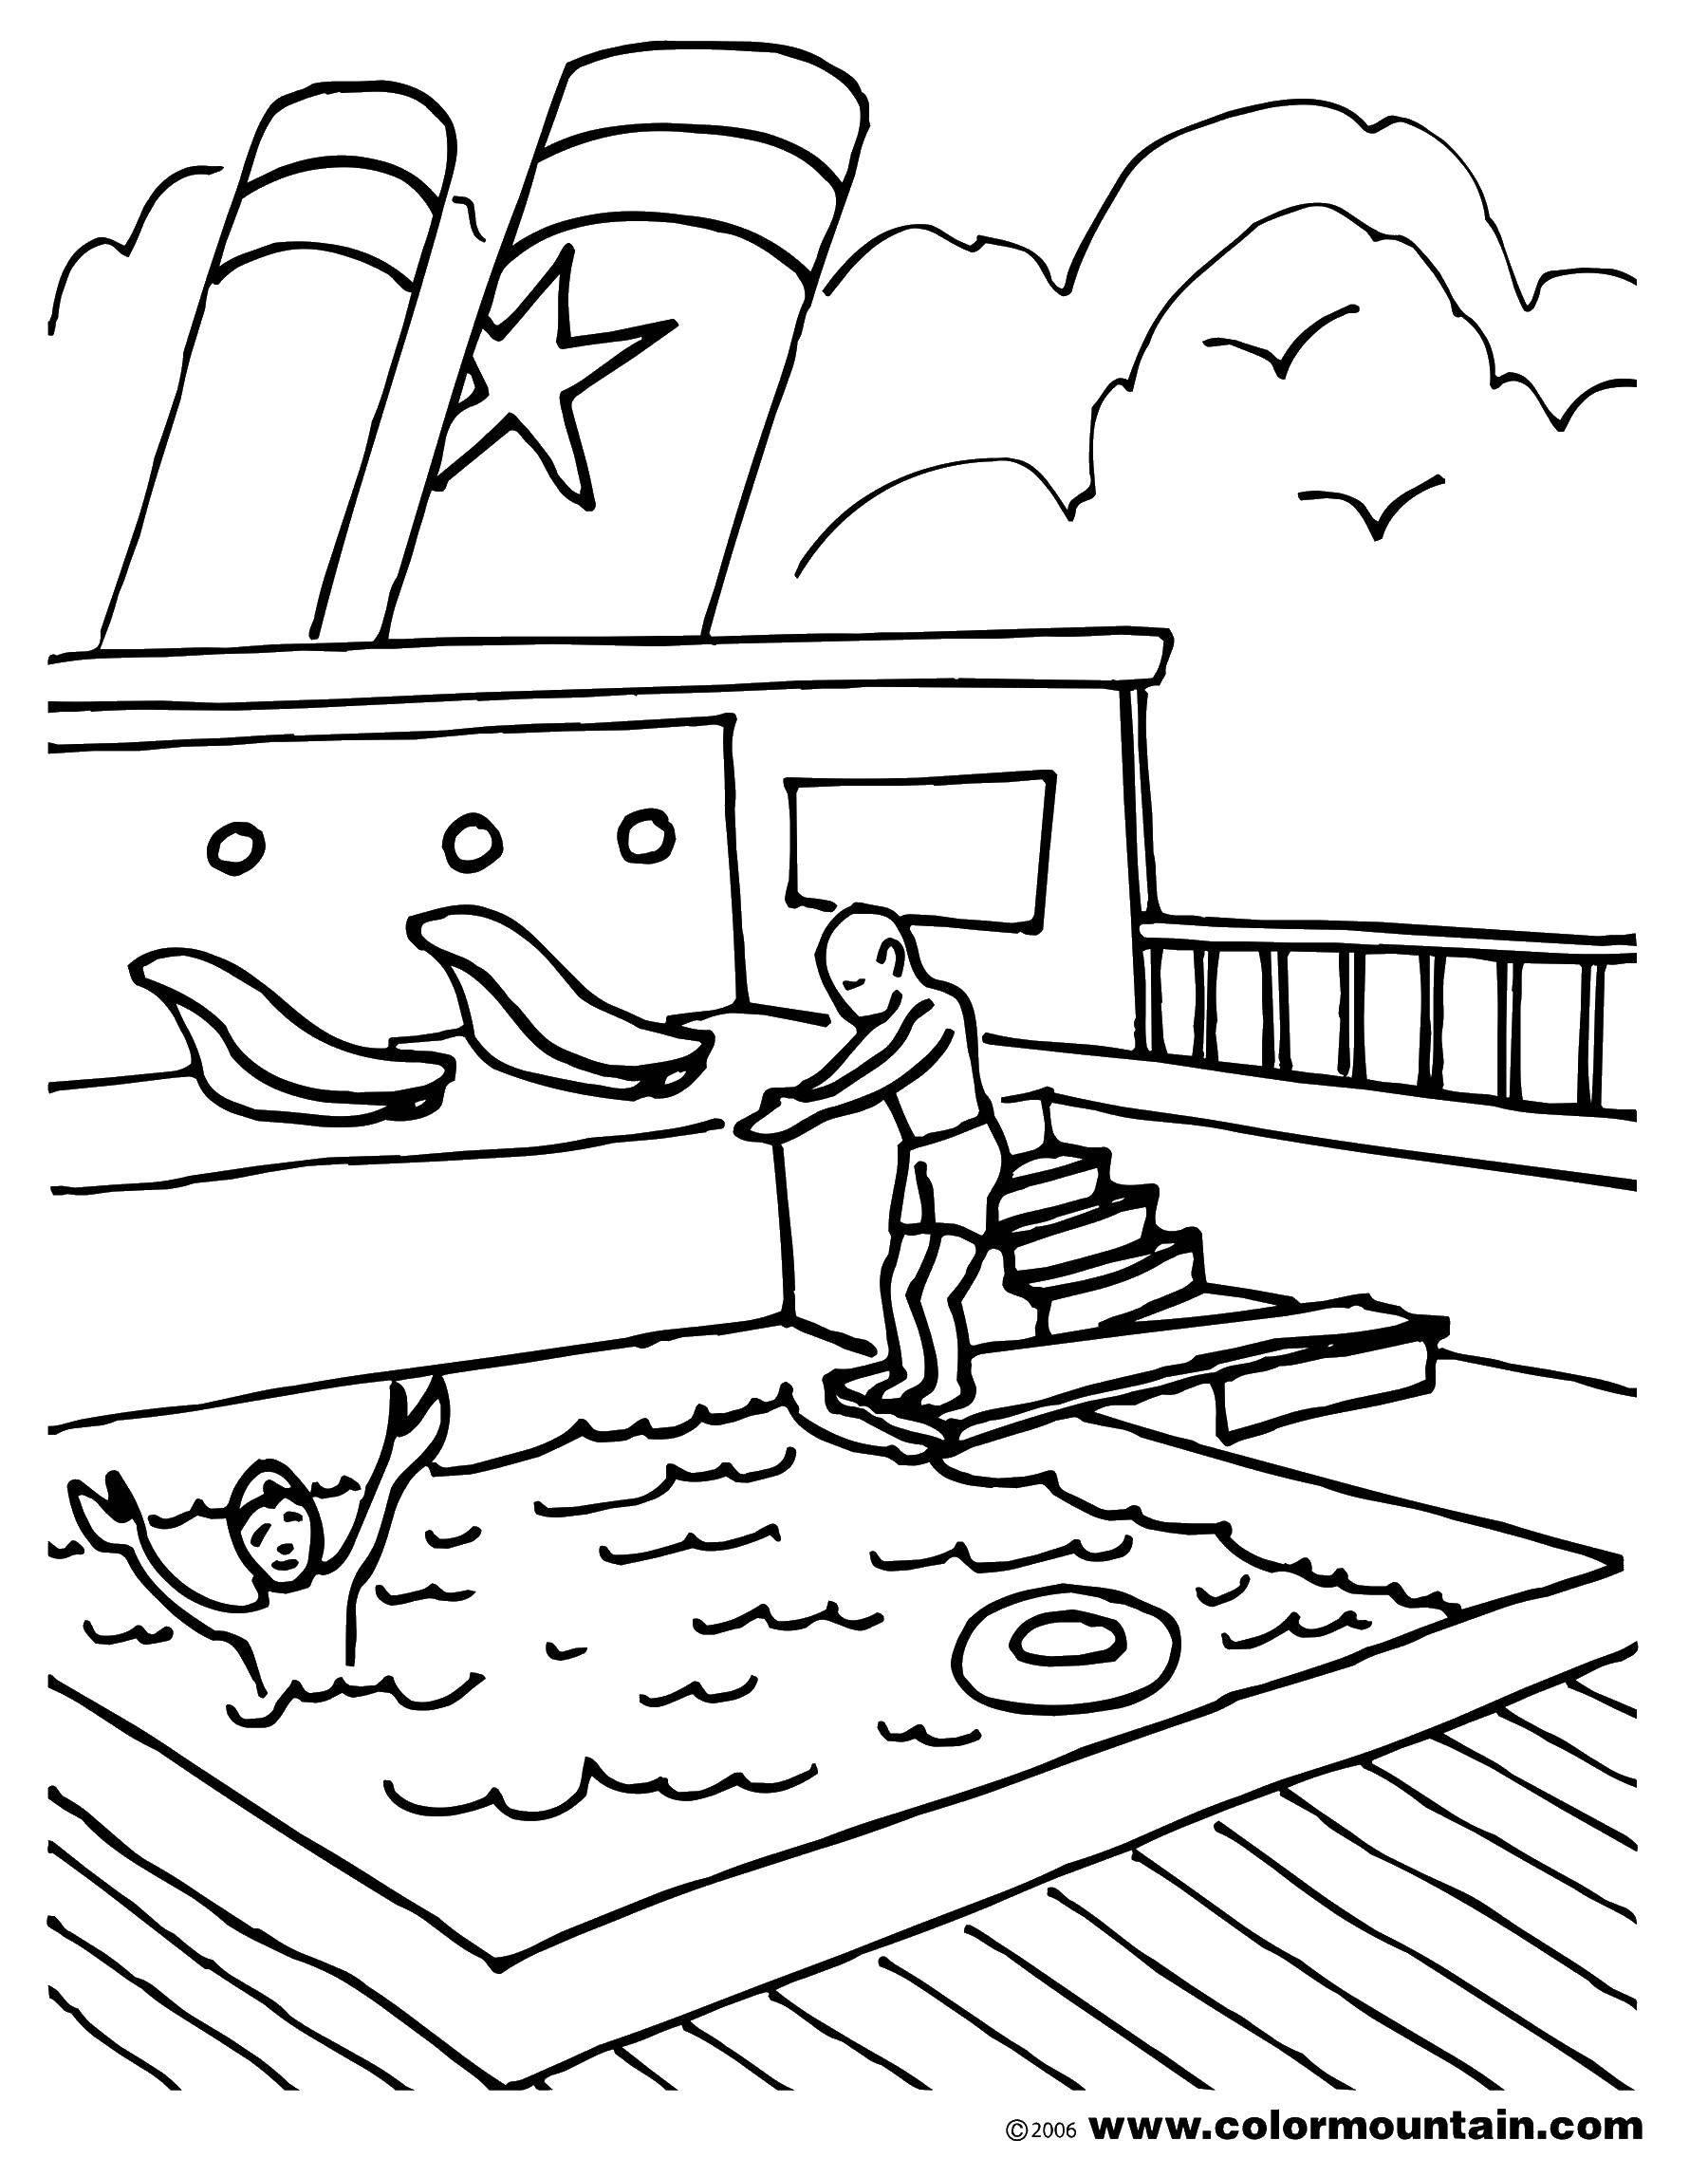 Название: Раскраска Бассейн на корабле. Категория: корабль. Теги: Корабль, вода.